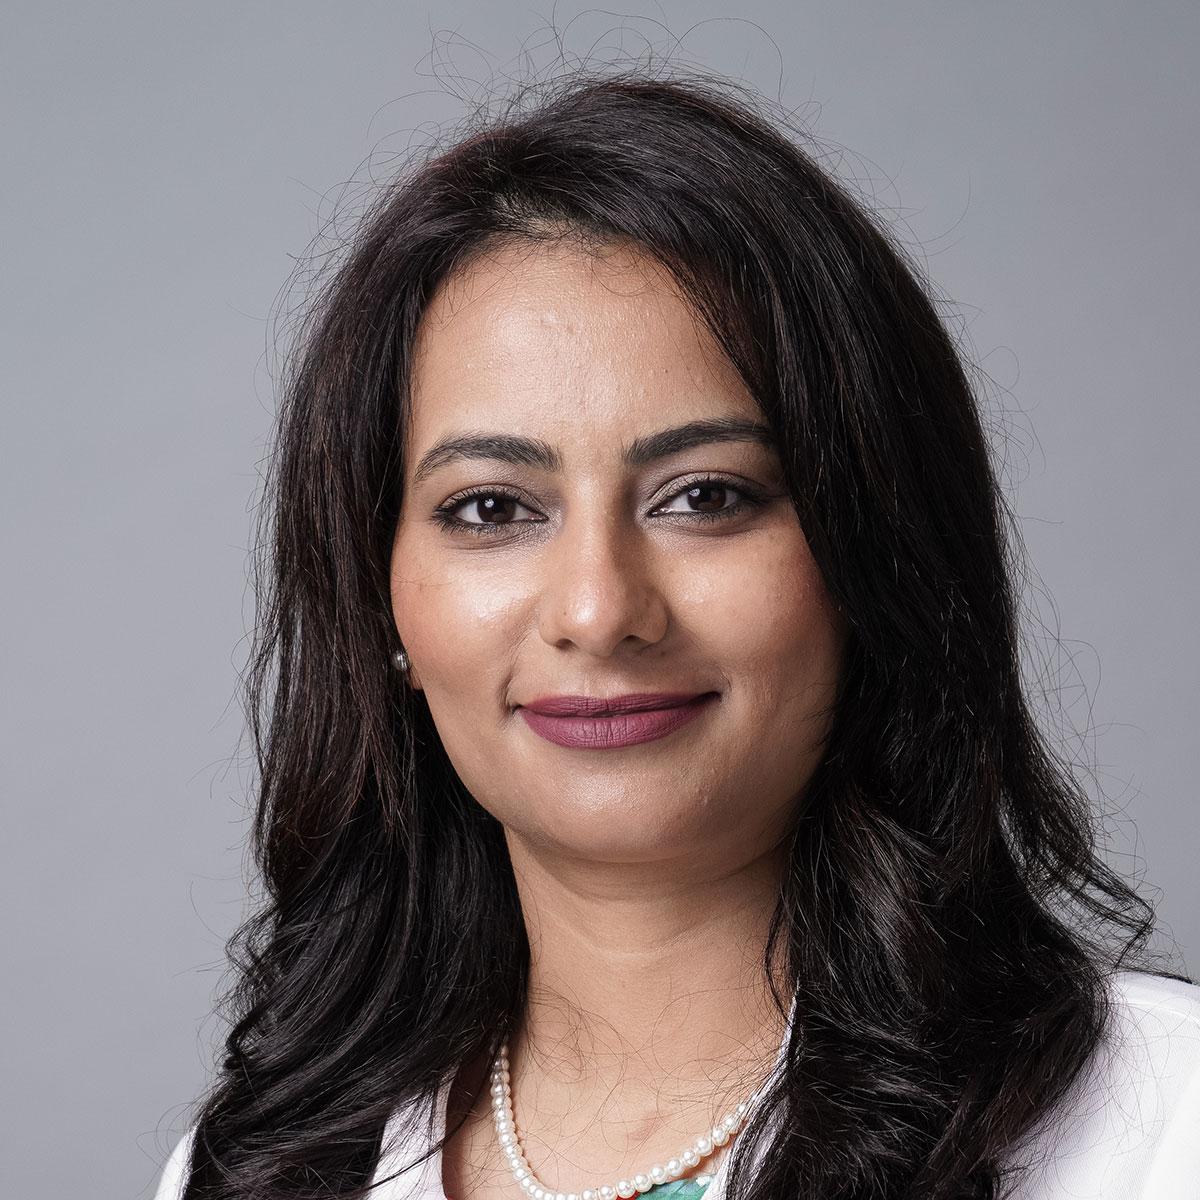 A friendly headshot of Dr. Rabia Khan